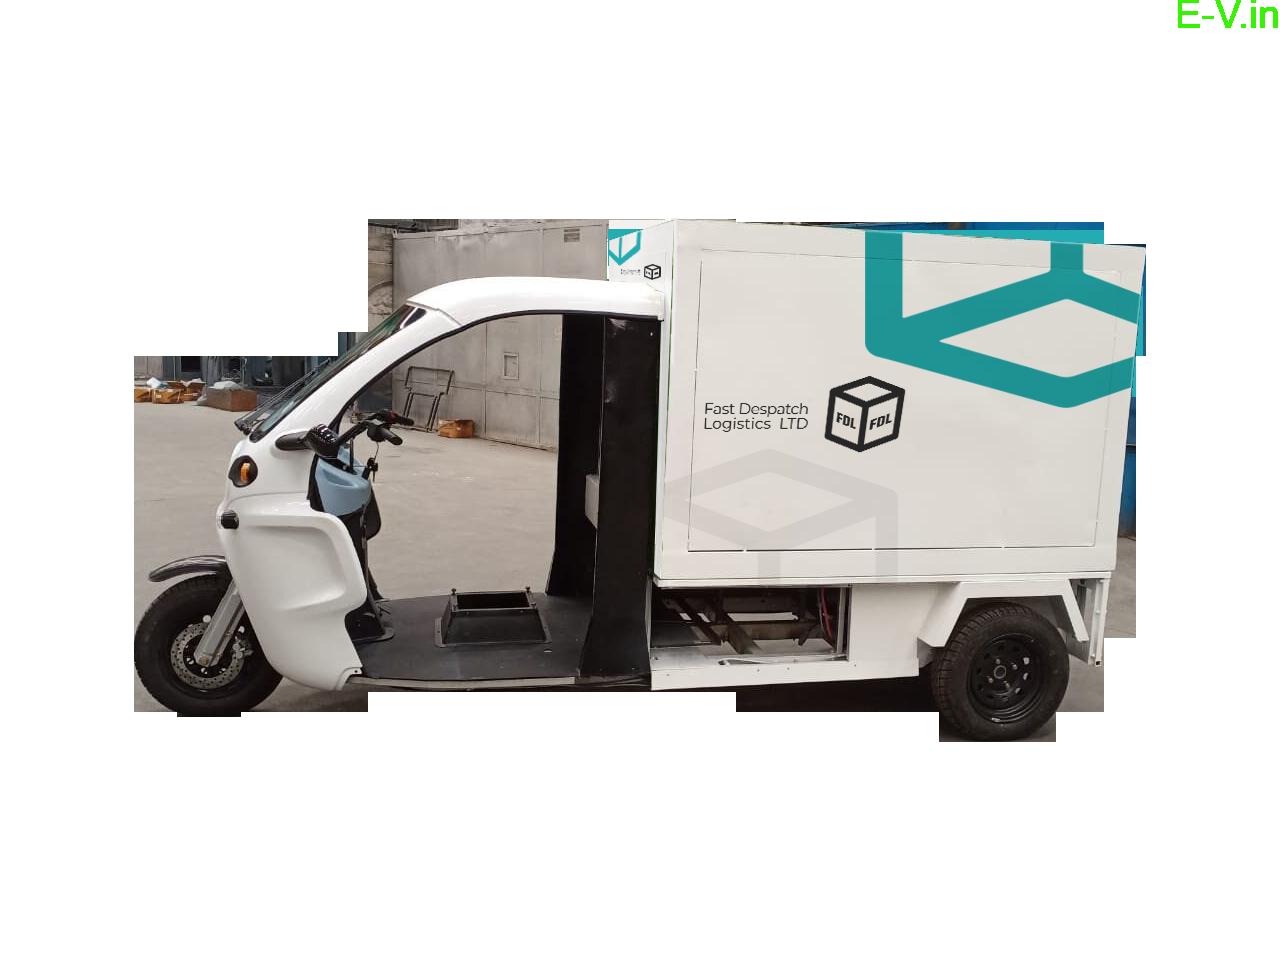 UK's Fast Despatch Logistics